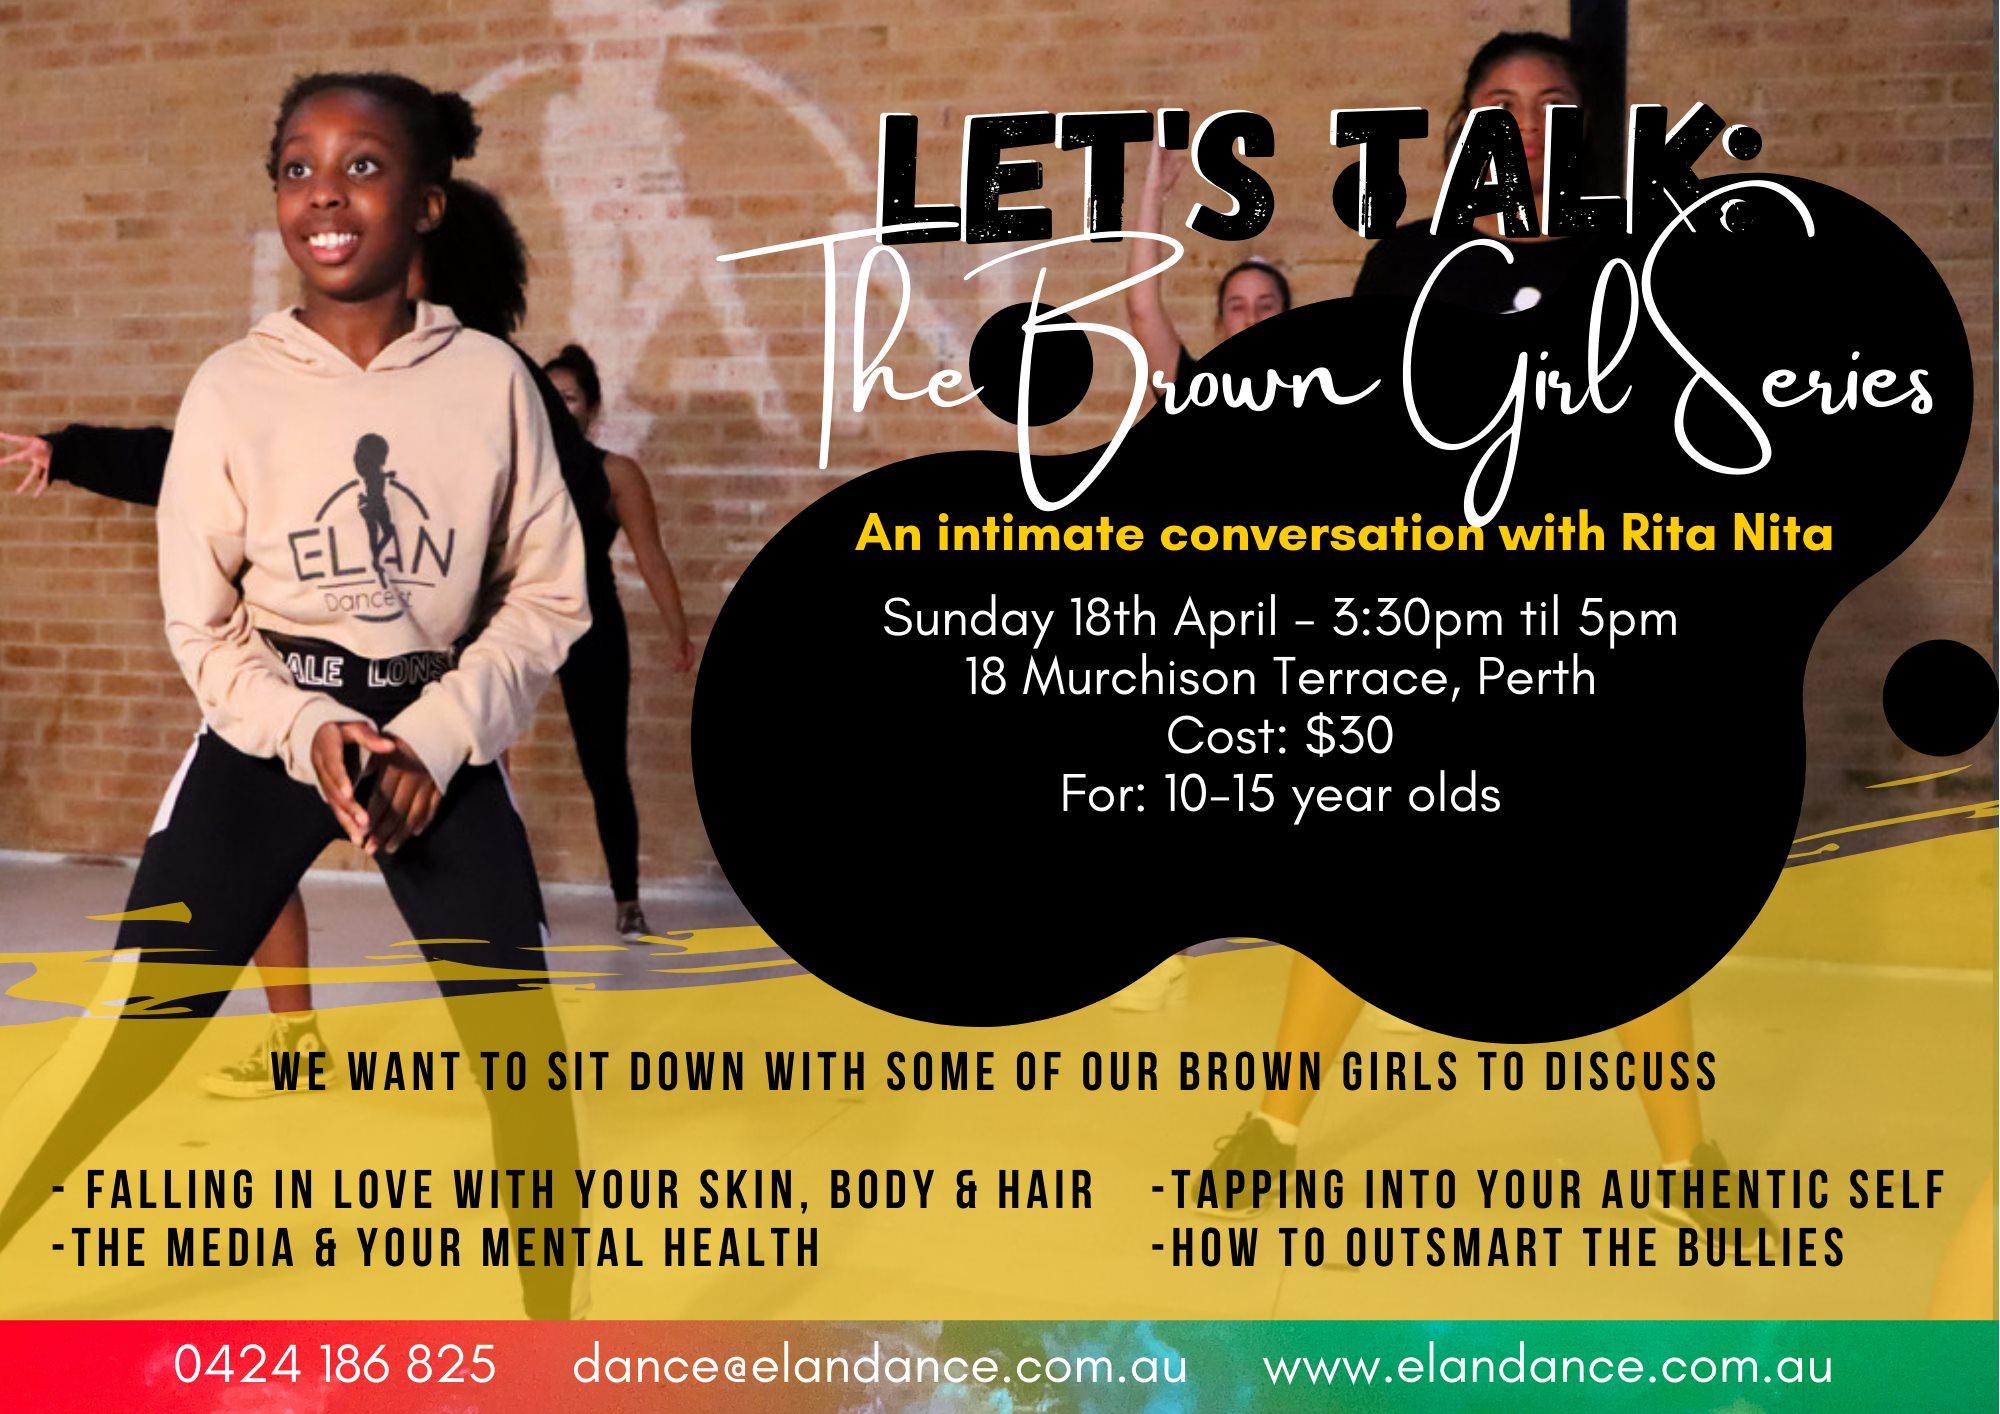 Raising Brown Girls Event Perth